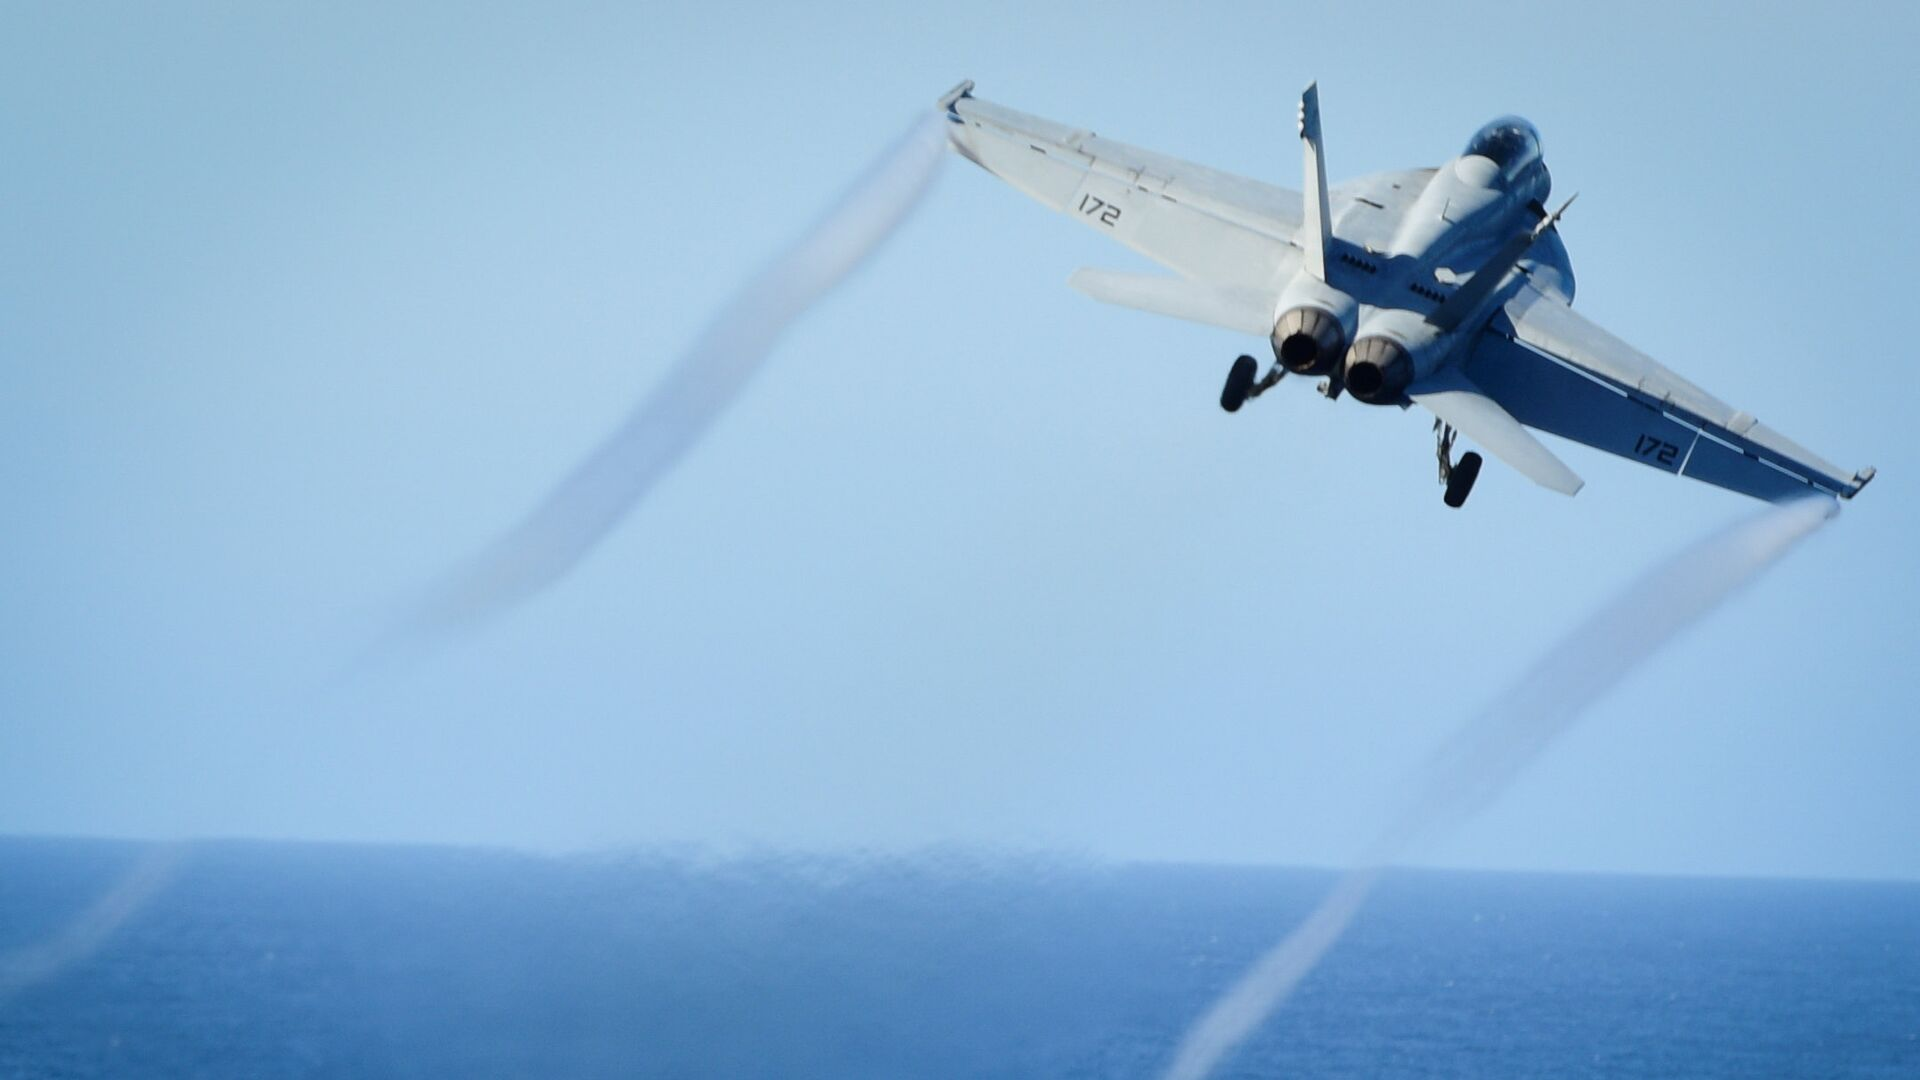 Rusya: Savaş uçağımız Estonya hava sahasını ihlal etmedi